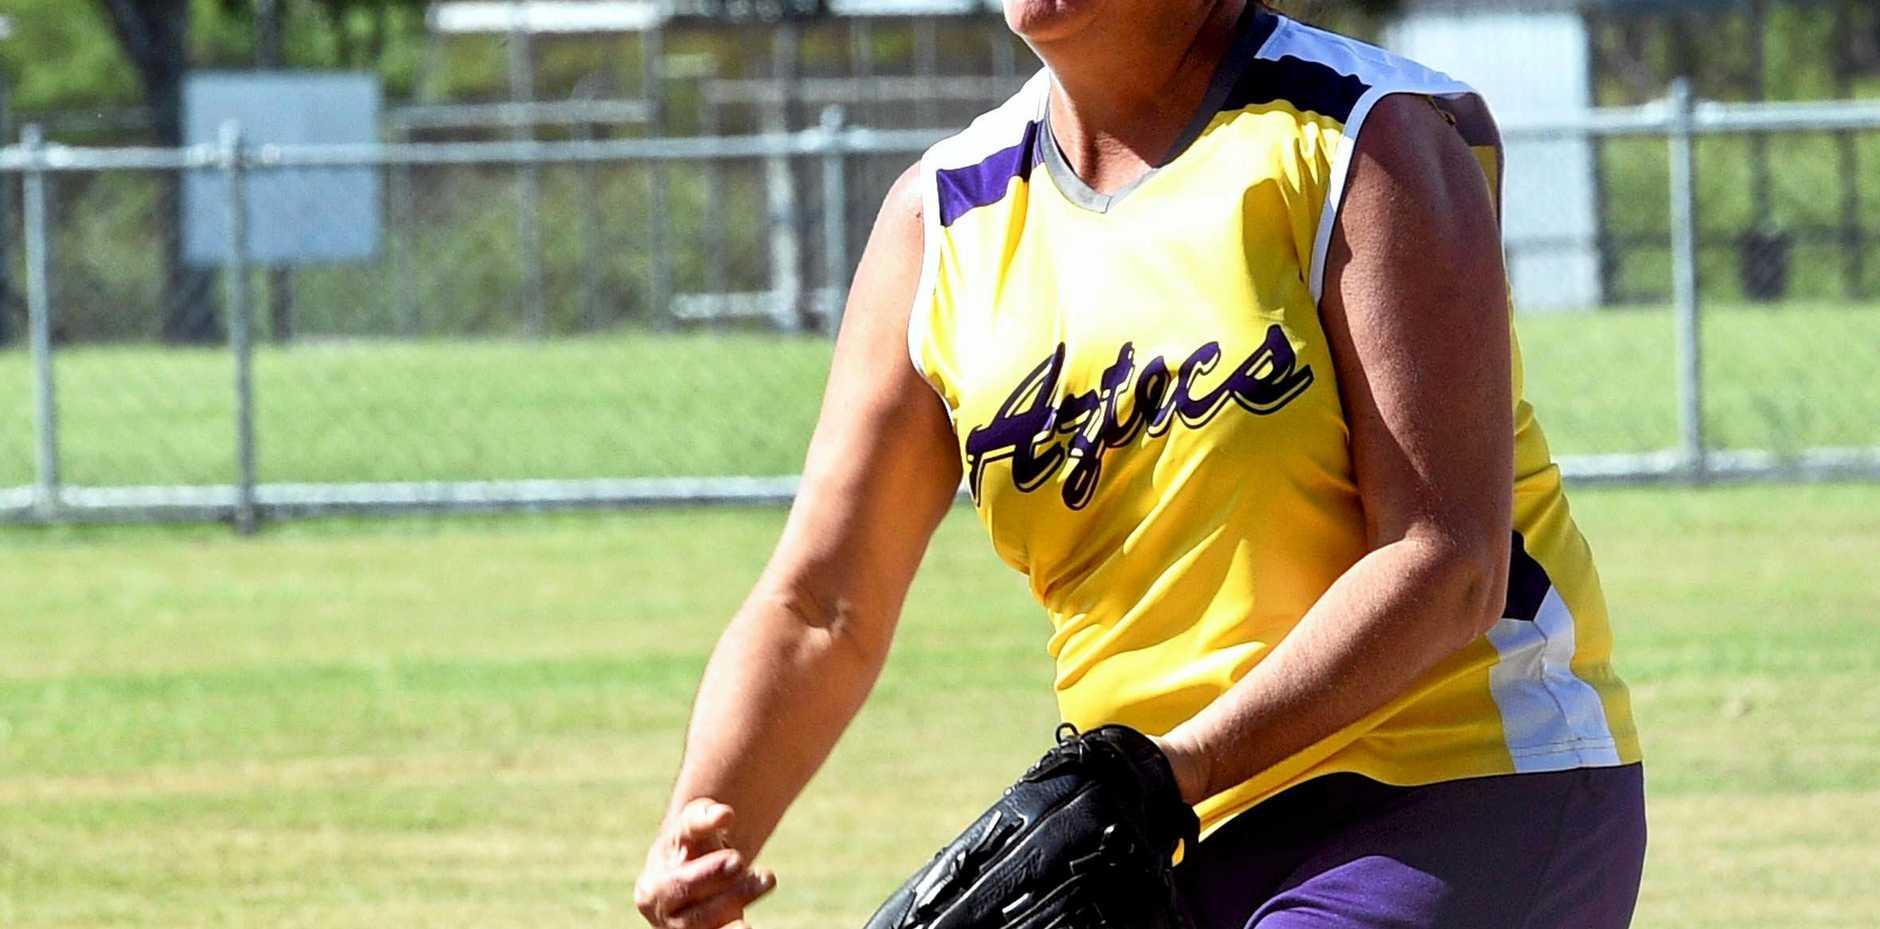 Maryborough softball grand finals - Women's A grade - Aztecs Apaches versus Sparx Hyne - Melissa Tobin.